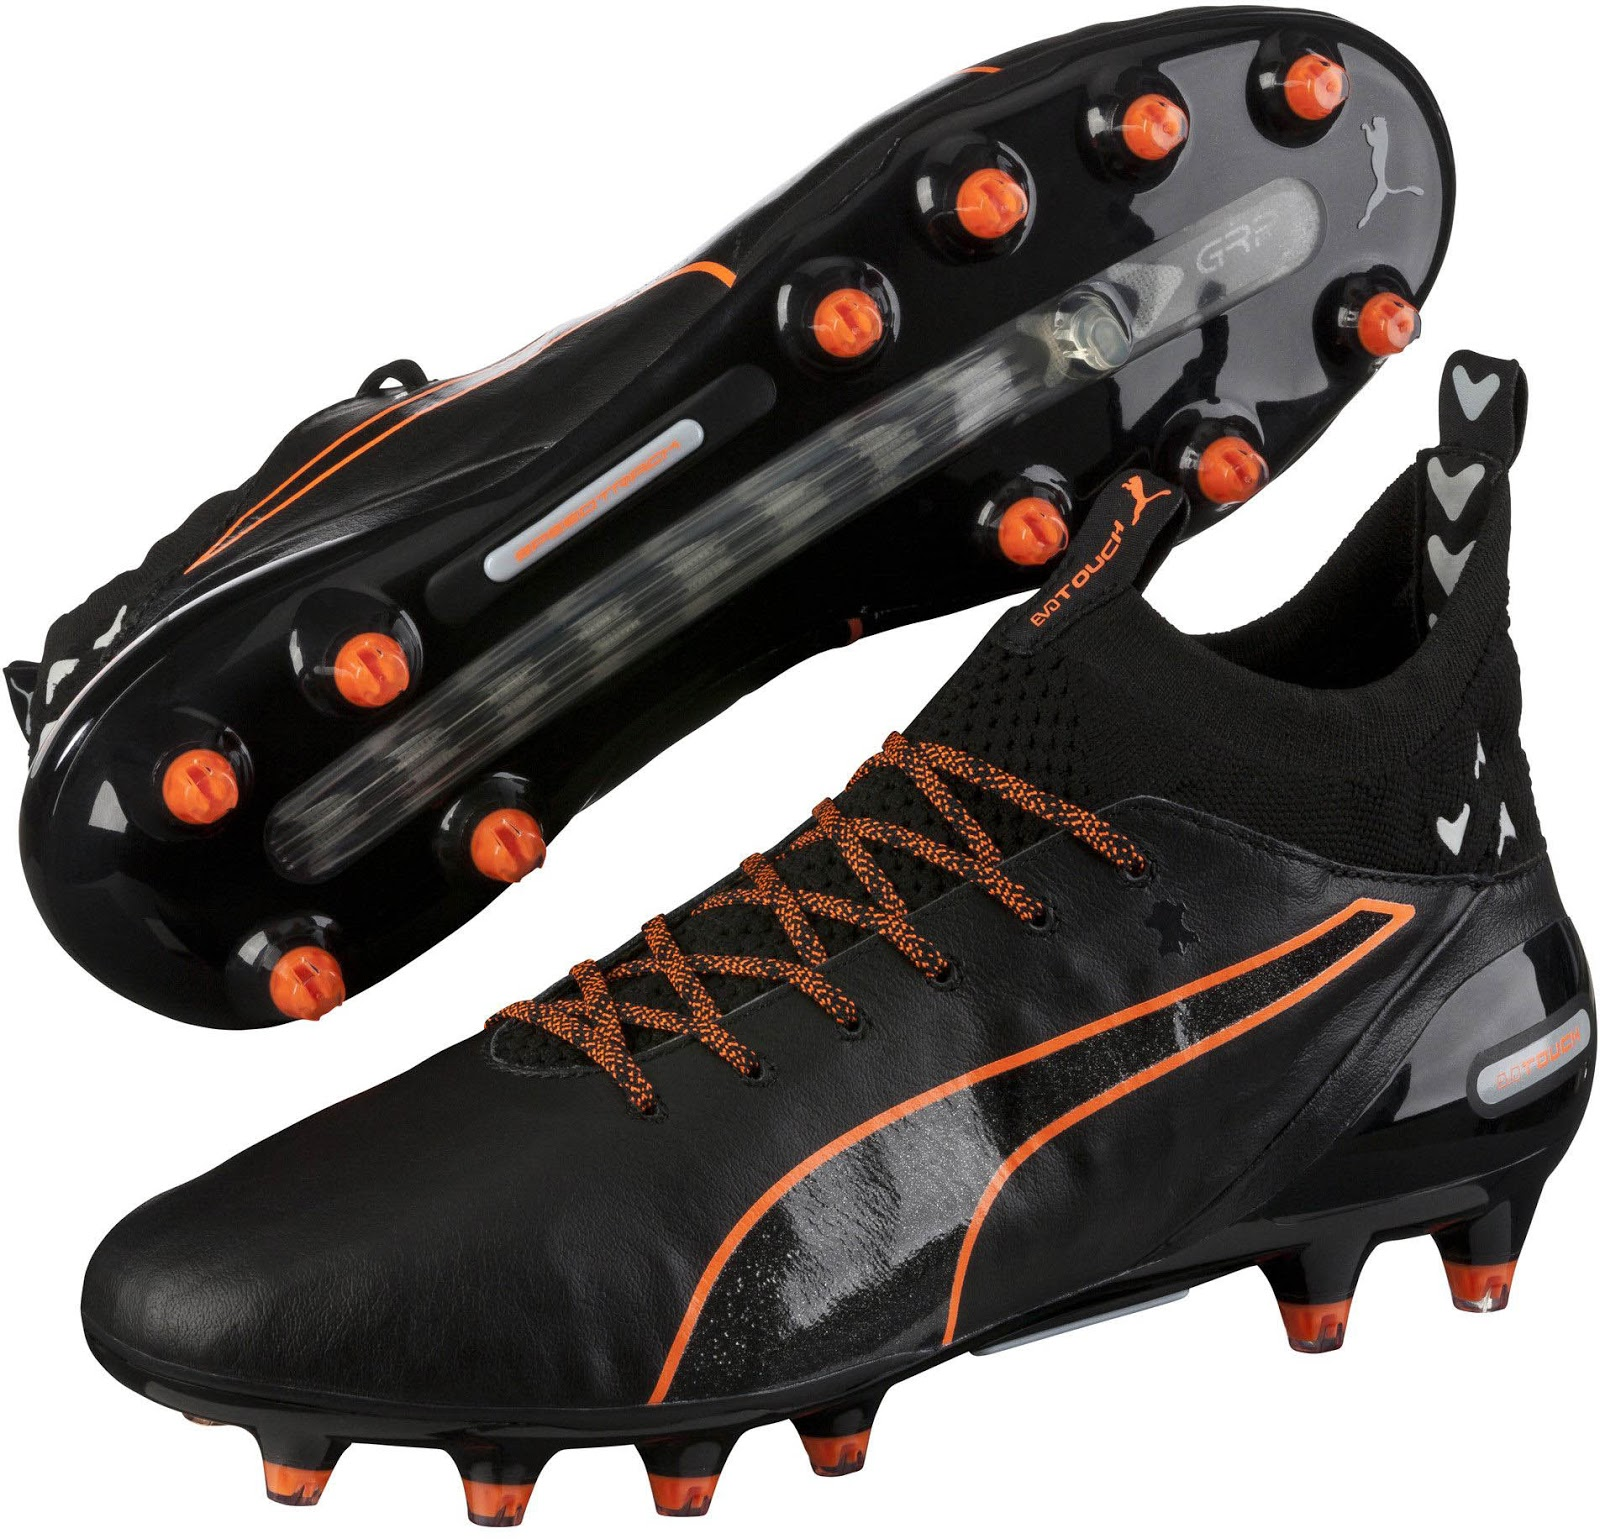 black-orange-puma-evotouch-2016-17-boots banner